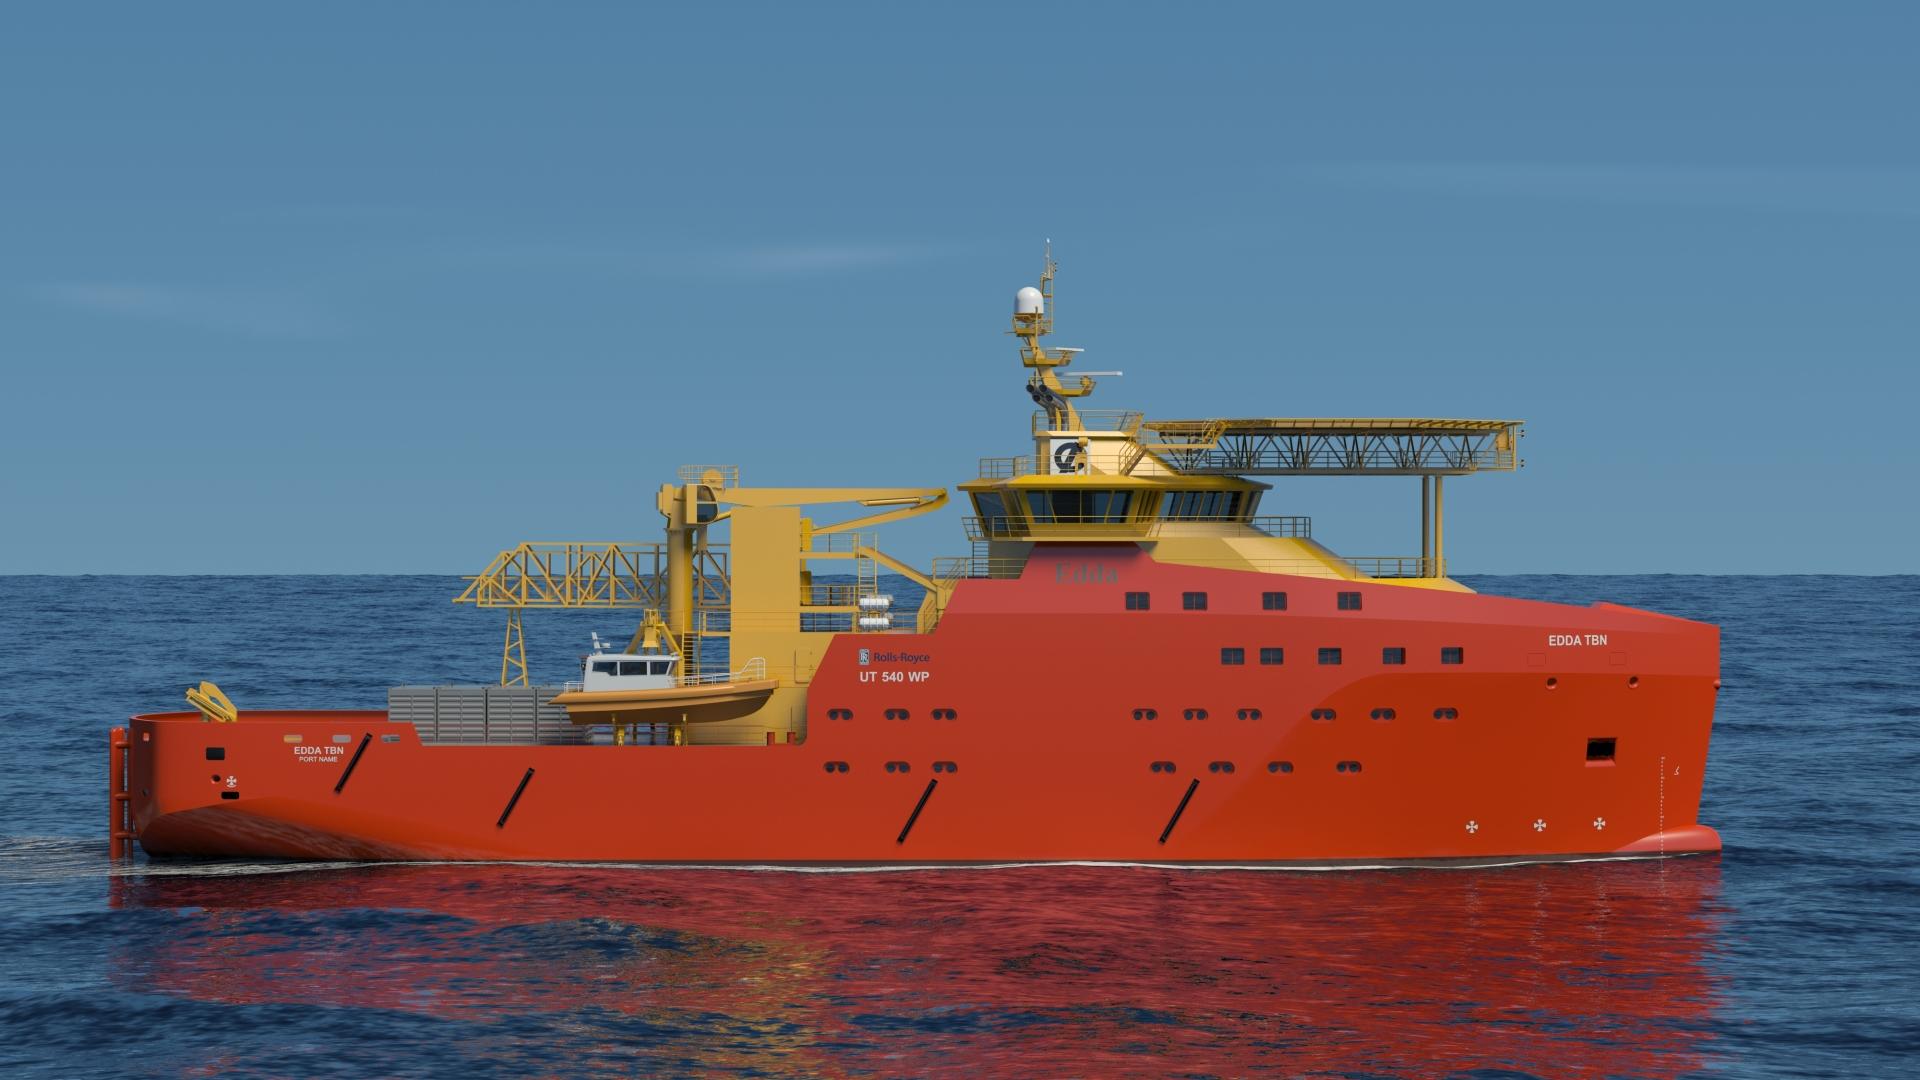 offshore_ut_540_wp_ostensjo_rederi_klein